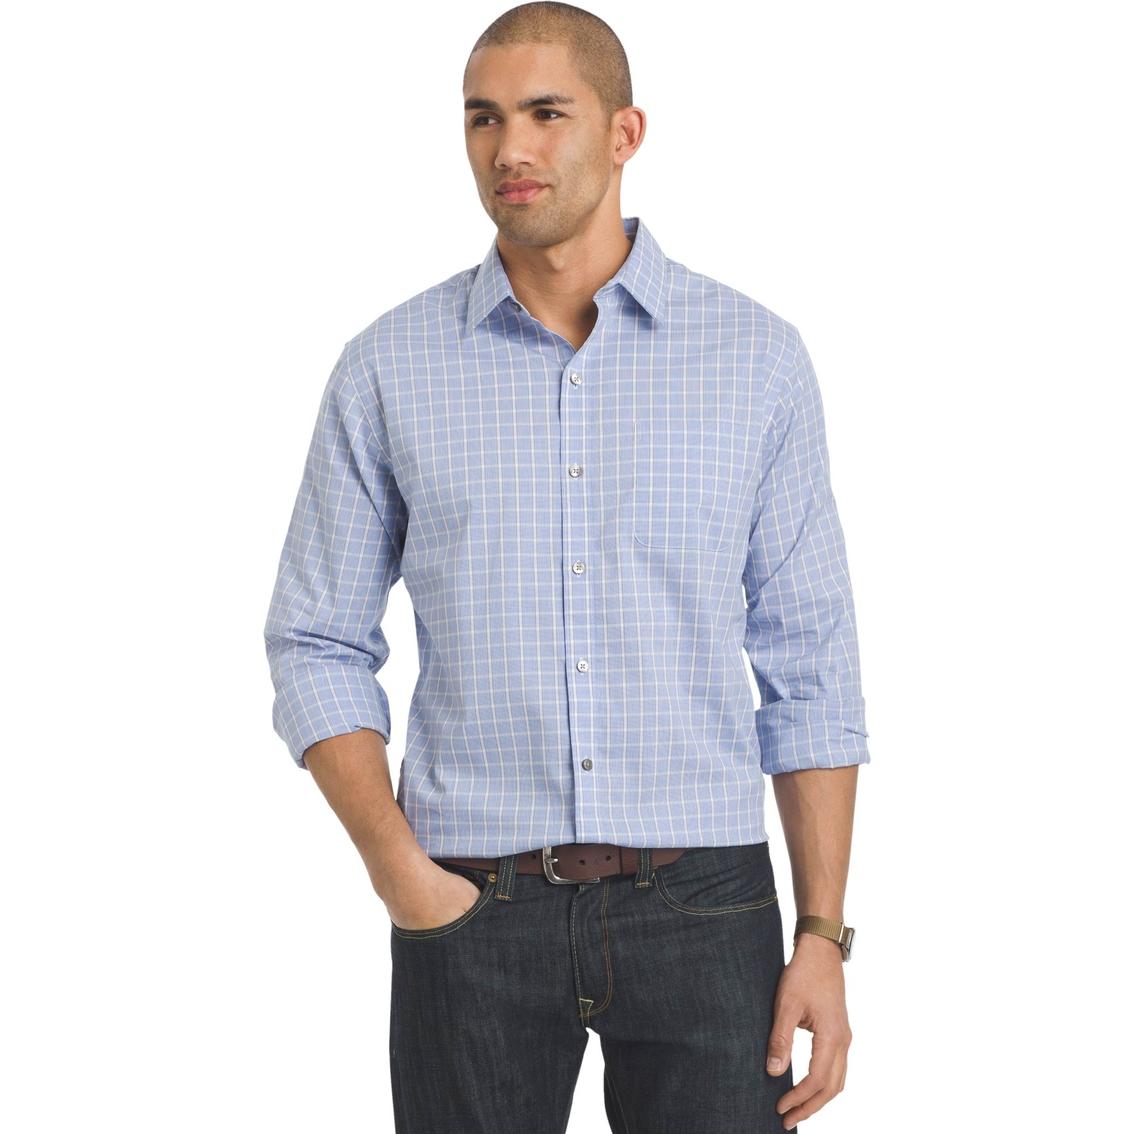 Van heusen sportwear traveler non iron stretch shirt for Van heusen iron free shirts